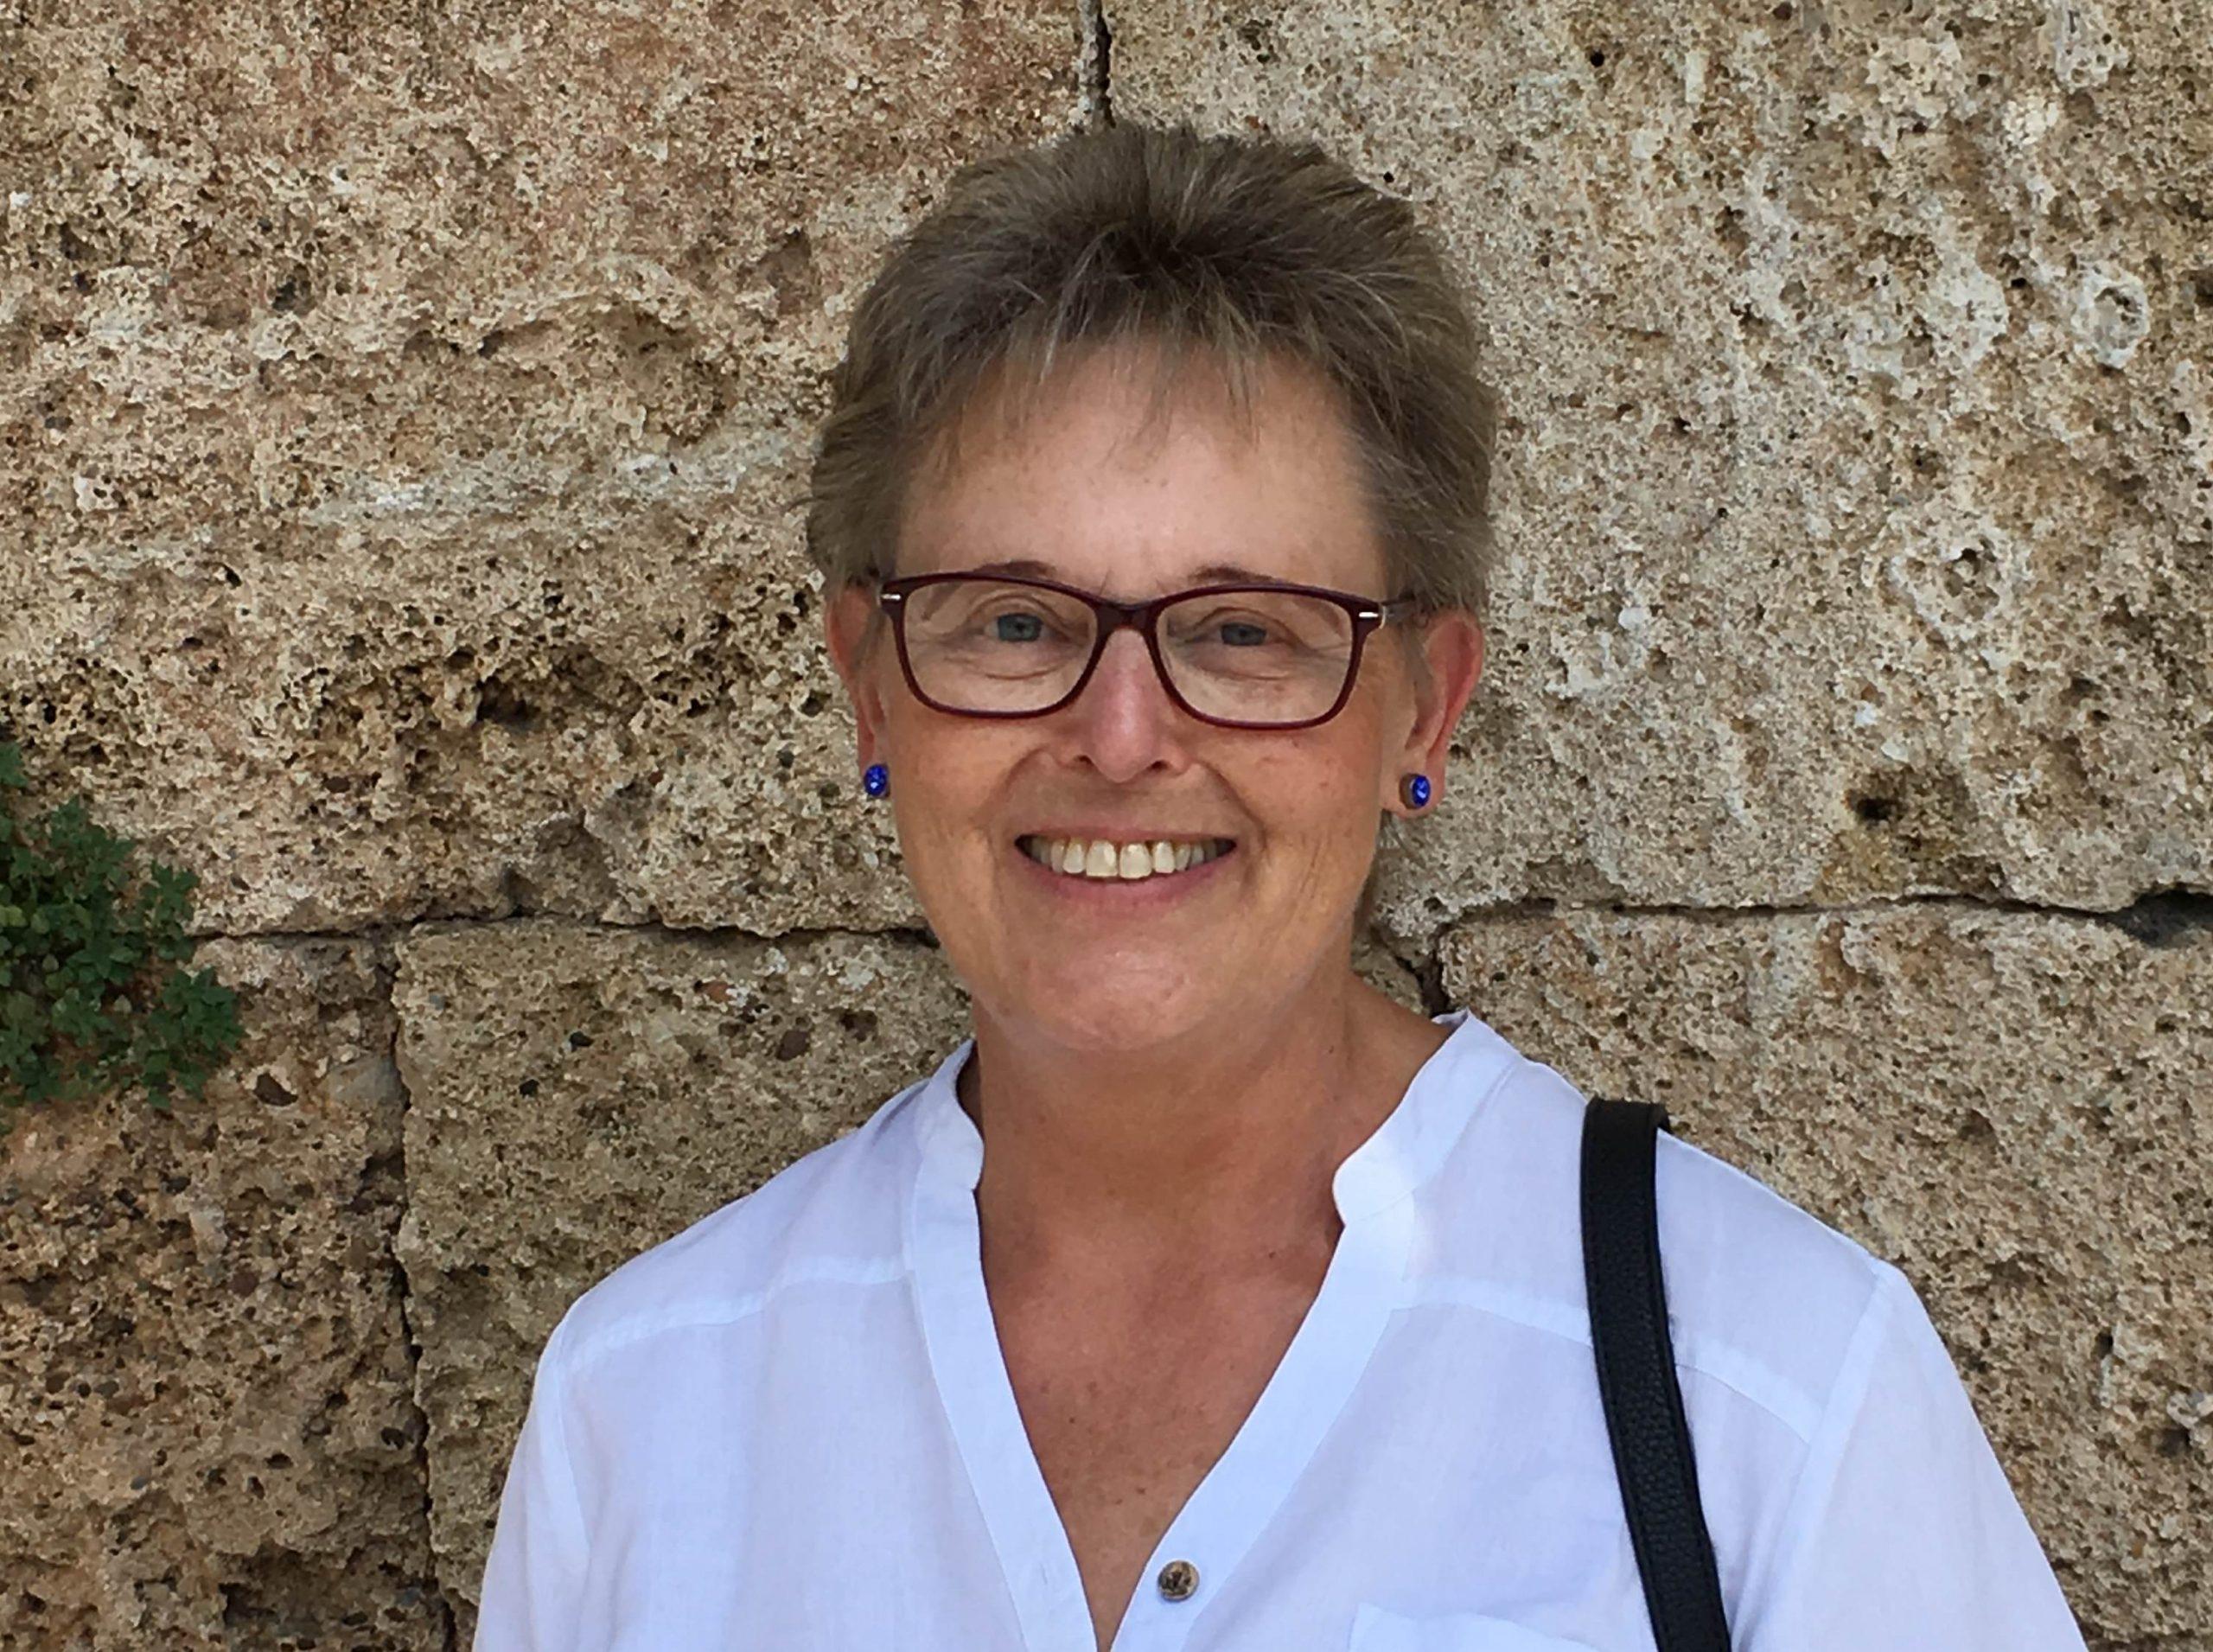 P. Margret Meier über Syrienreise